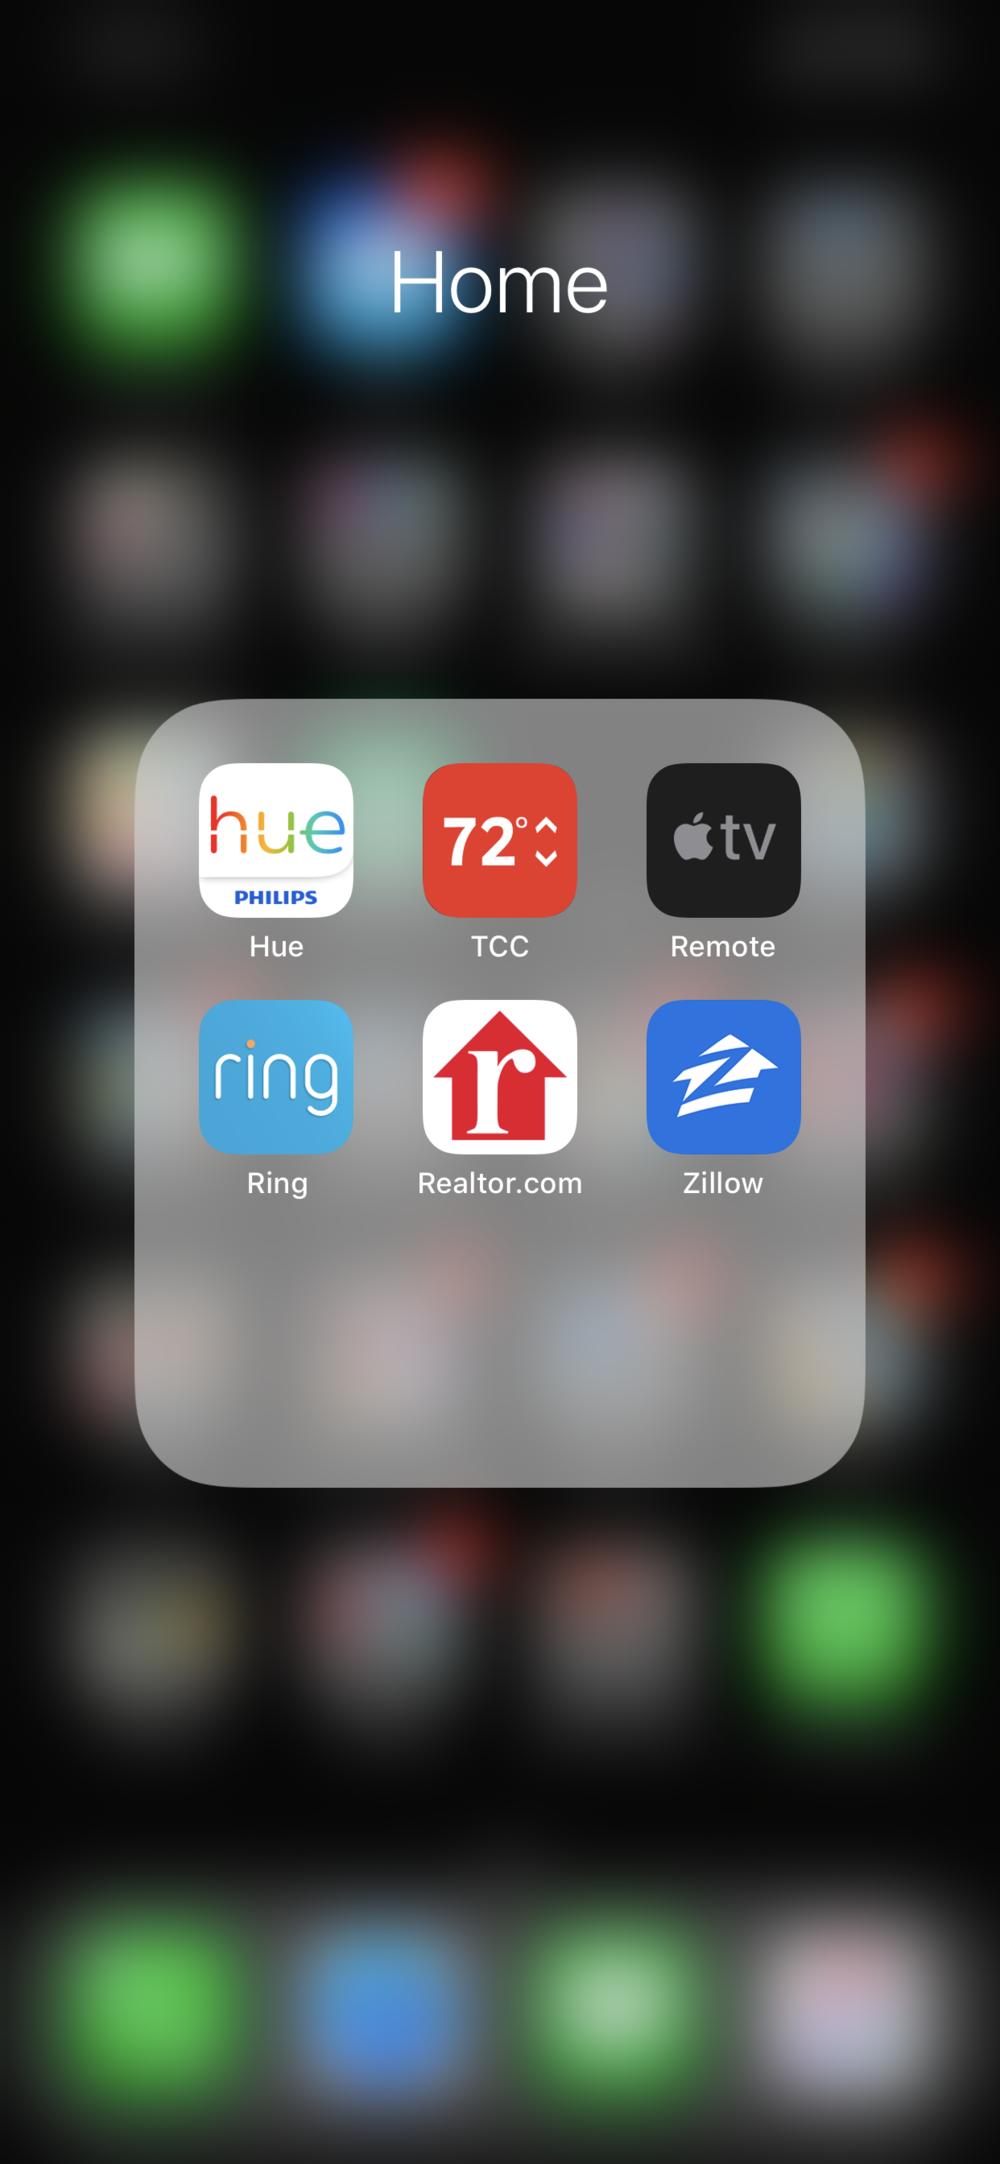 home screenshot.png